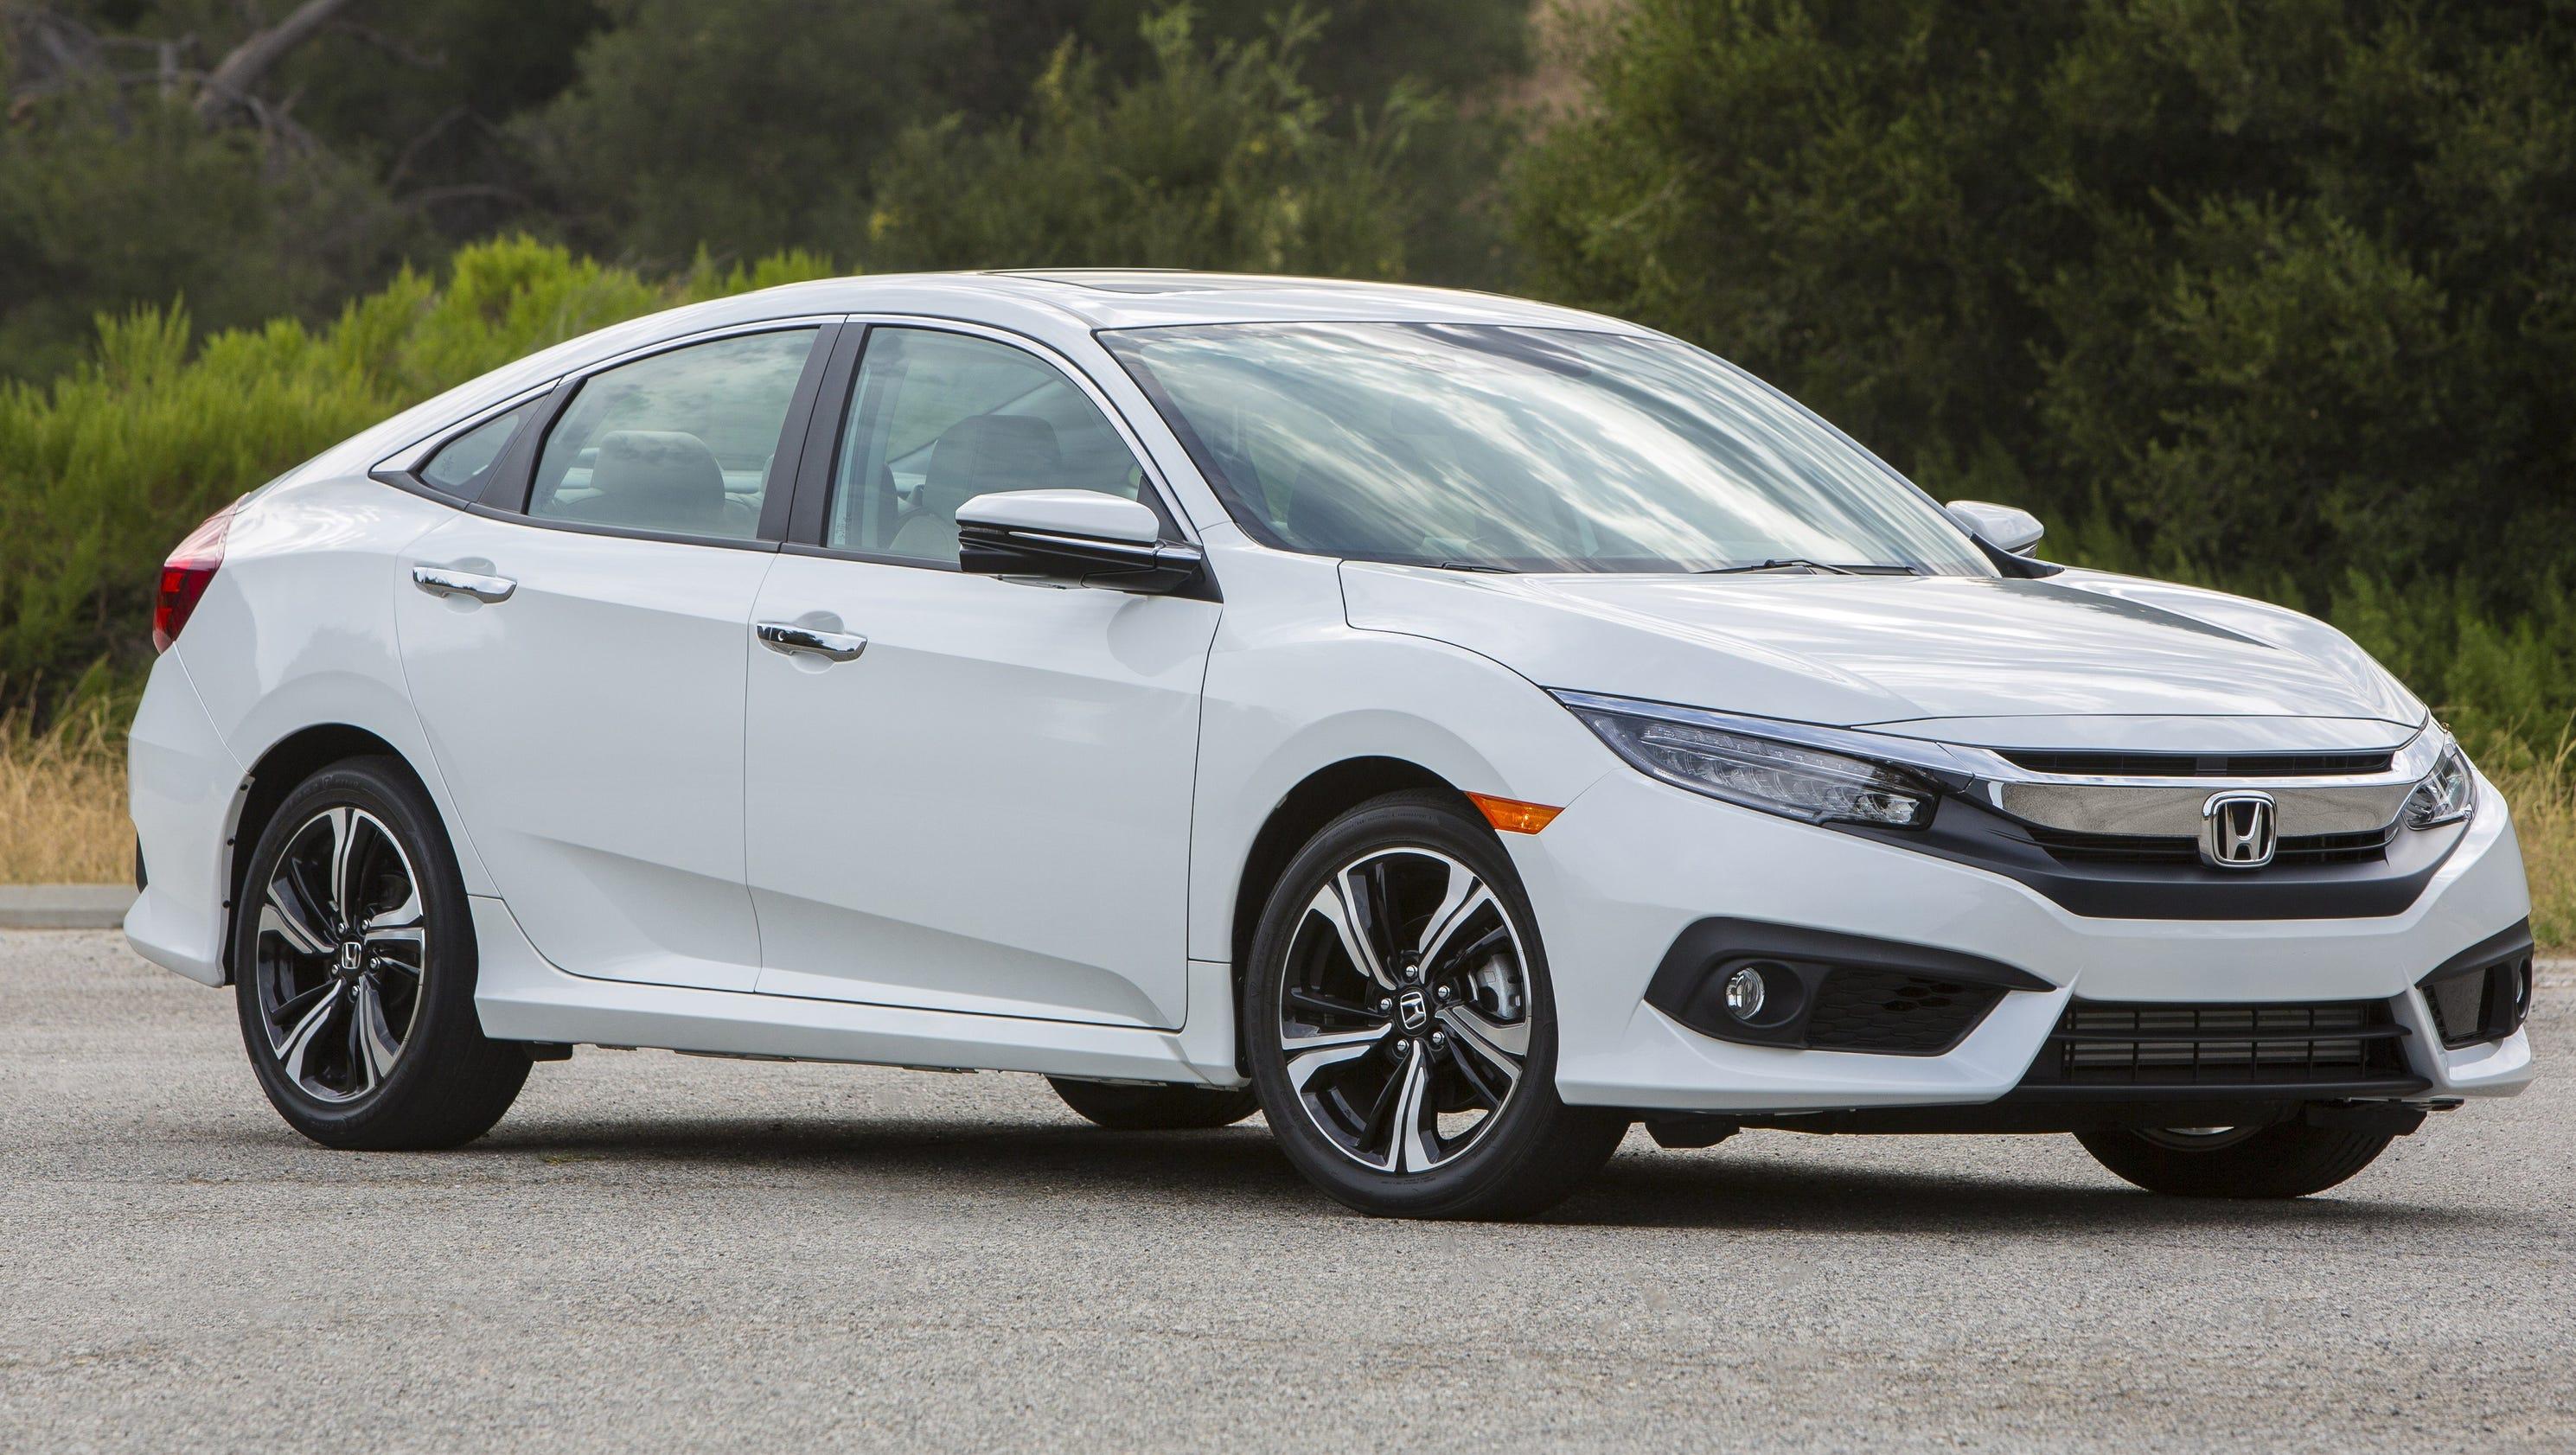 Honda Civic Coupe For Sale >> New, bigger Honda Civic breaks 40 mpg barrier